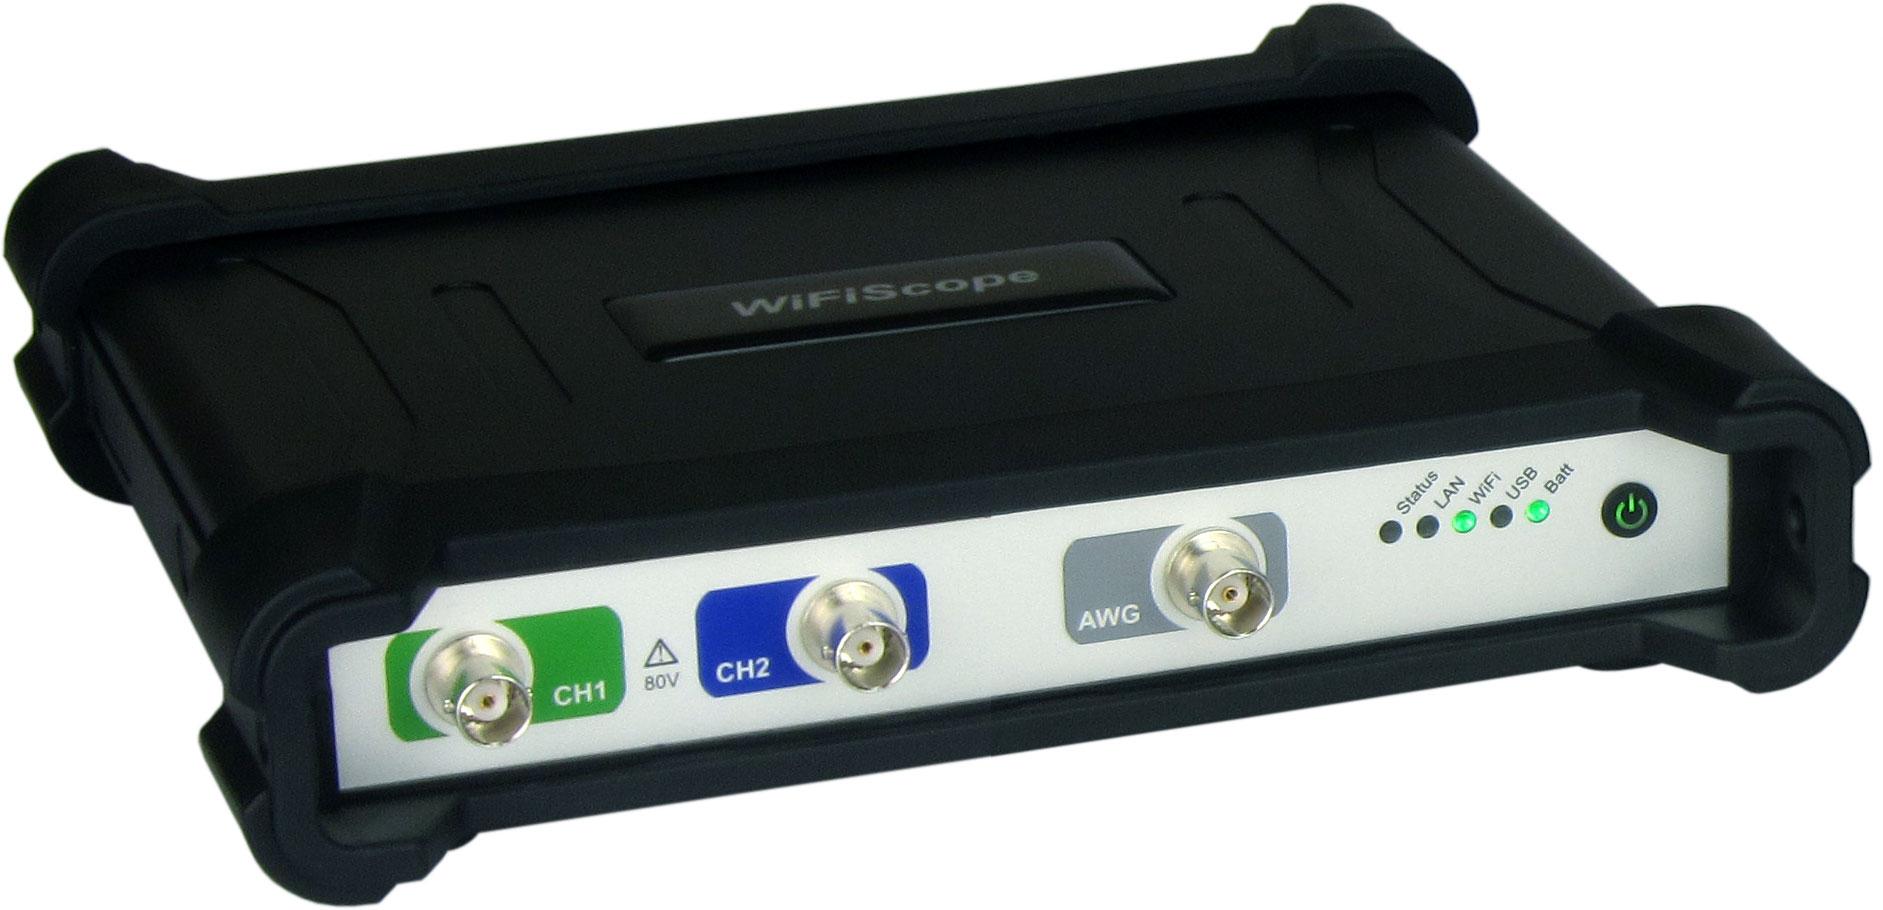 """WS5(Wifiスコープ)"" 無線2CHオシロスコープ+AWG"